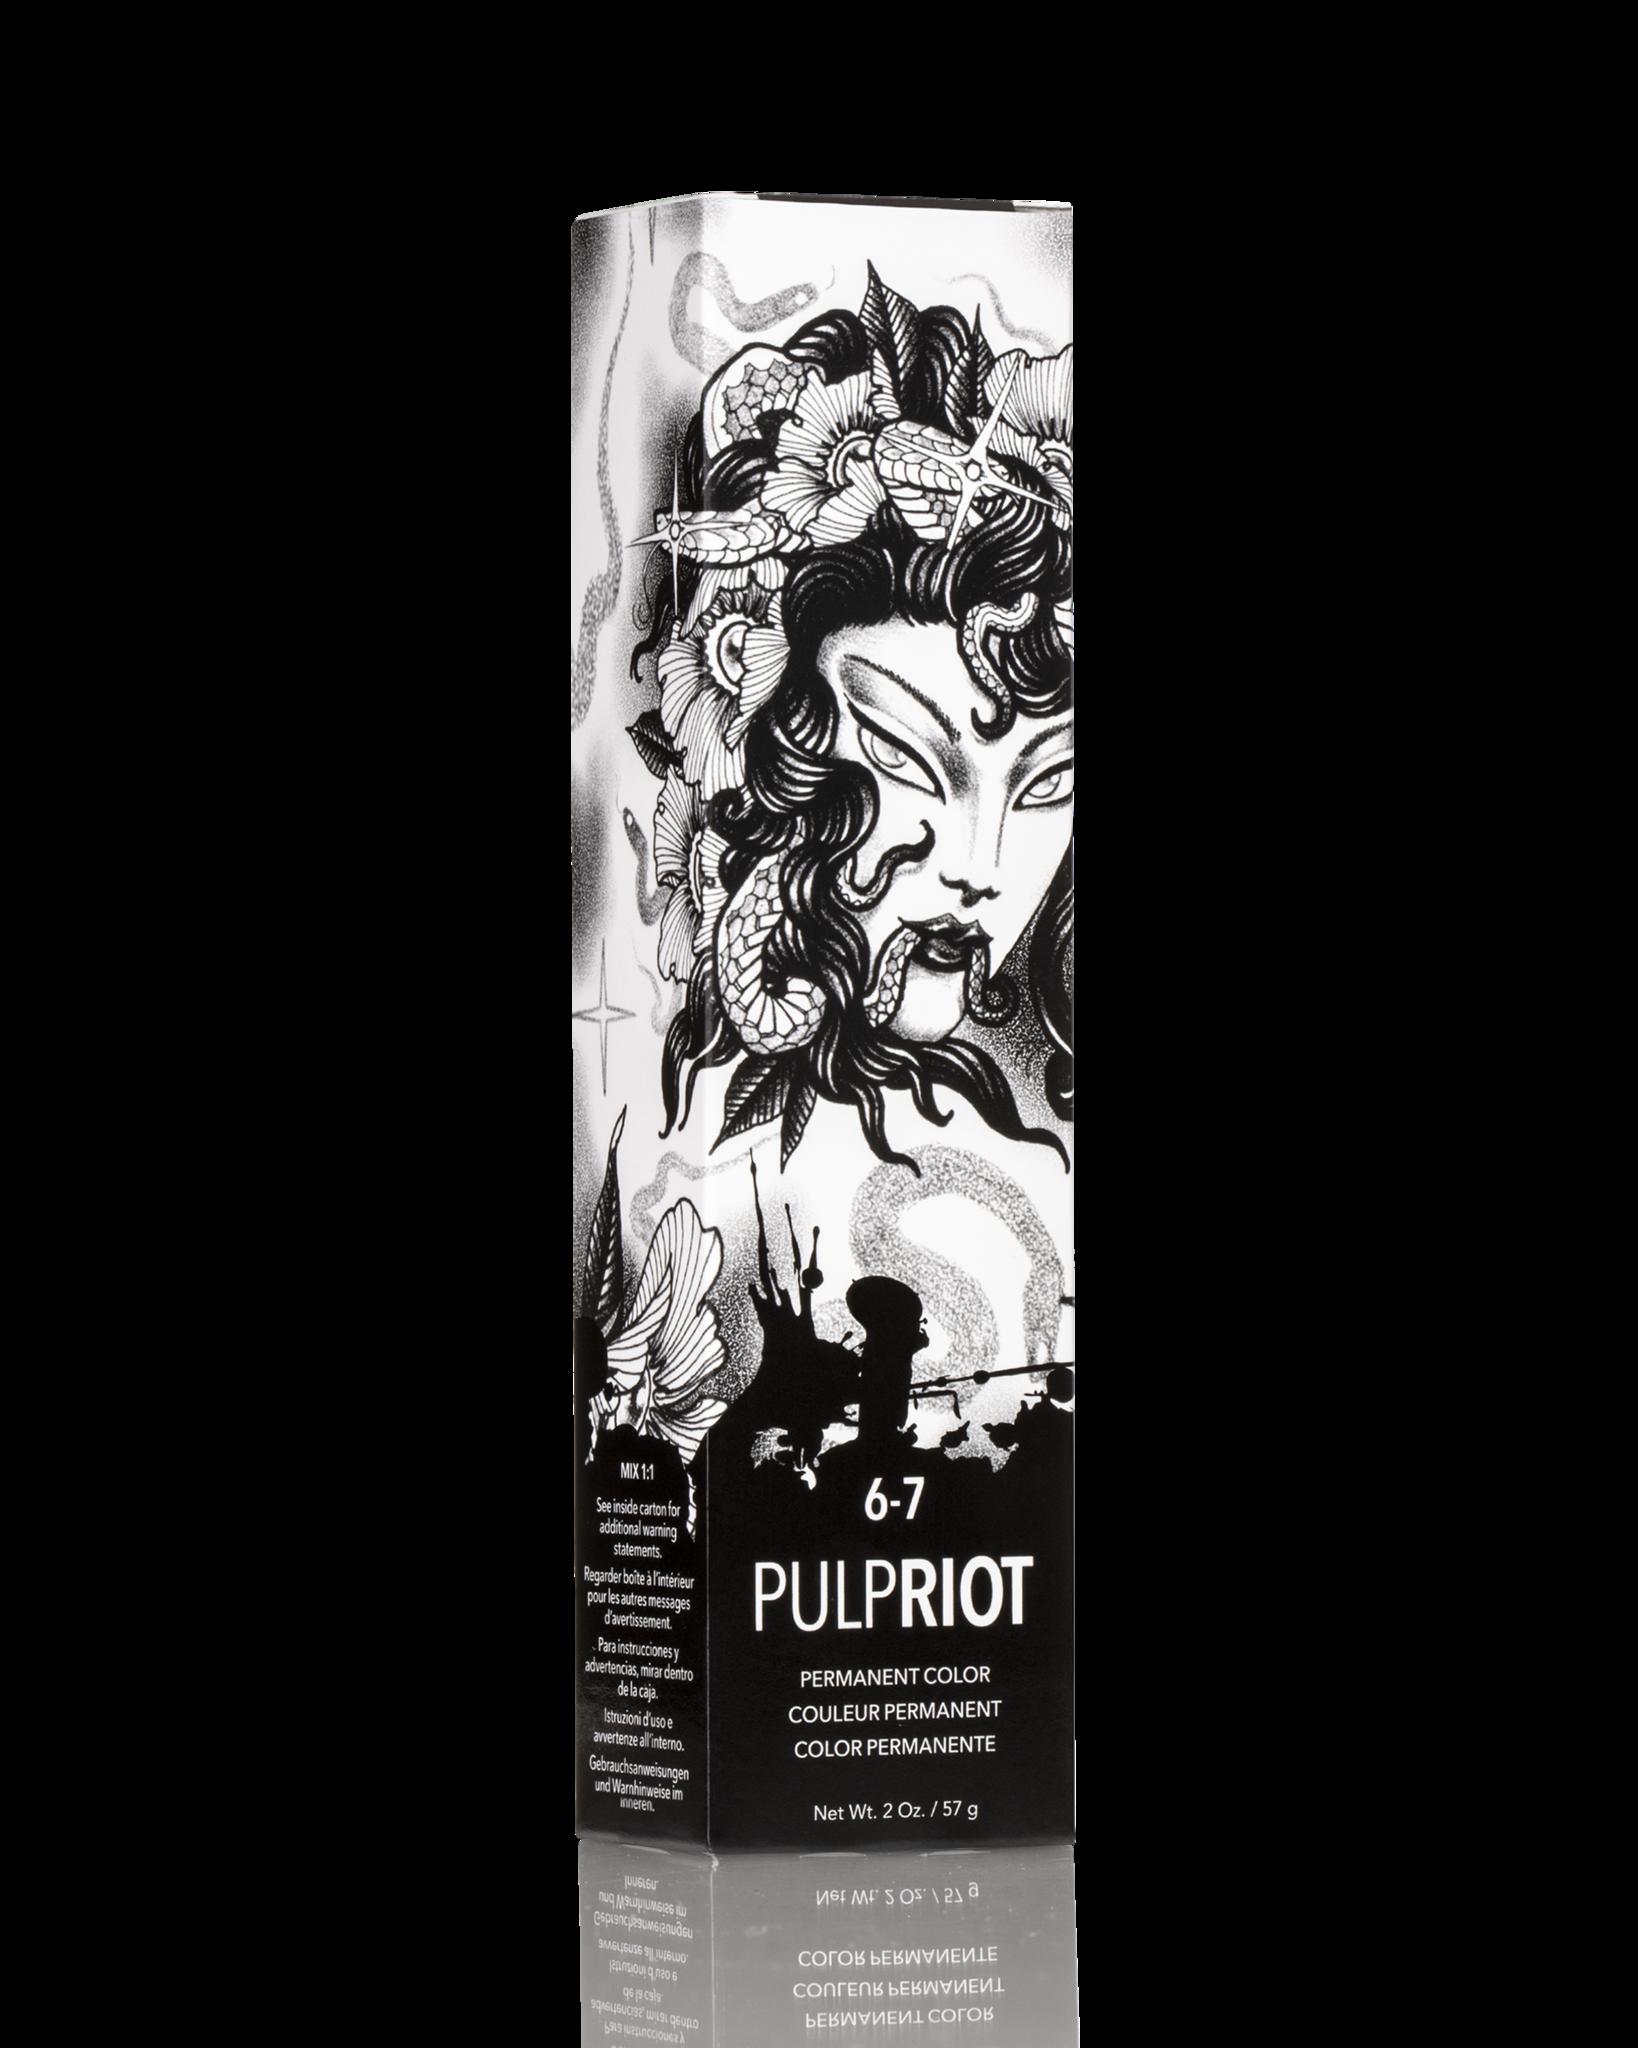 Pulp Riot PULP RIOT FACTION 8 MATE 6-7